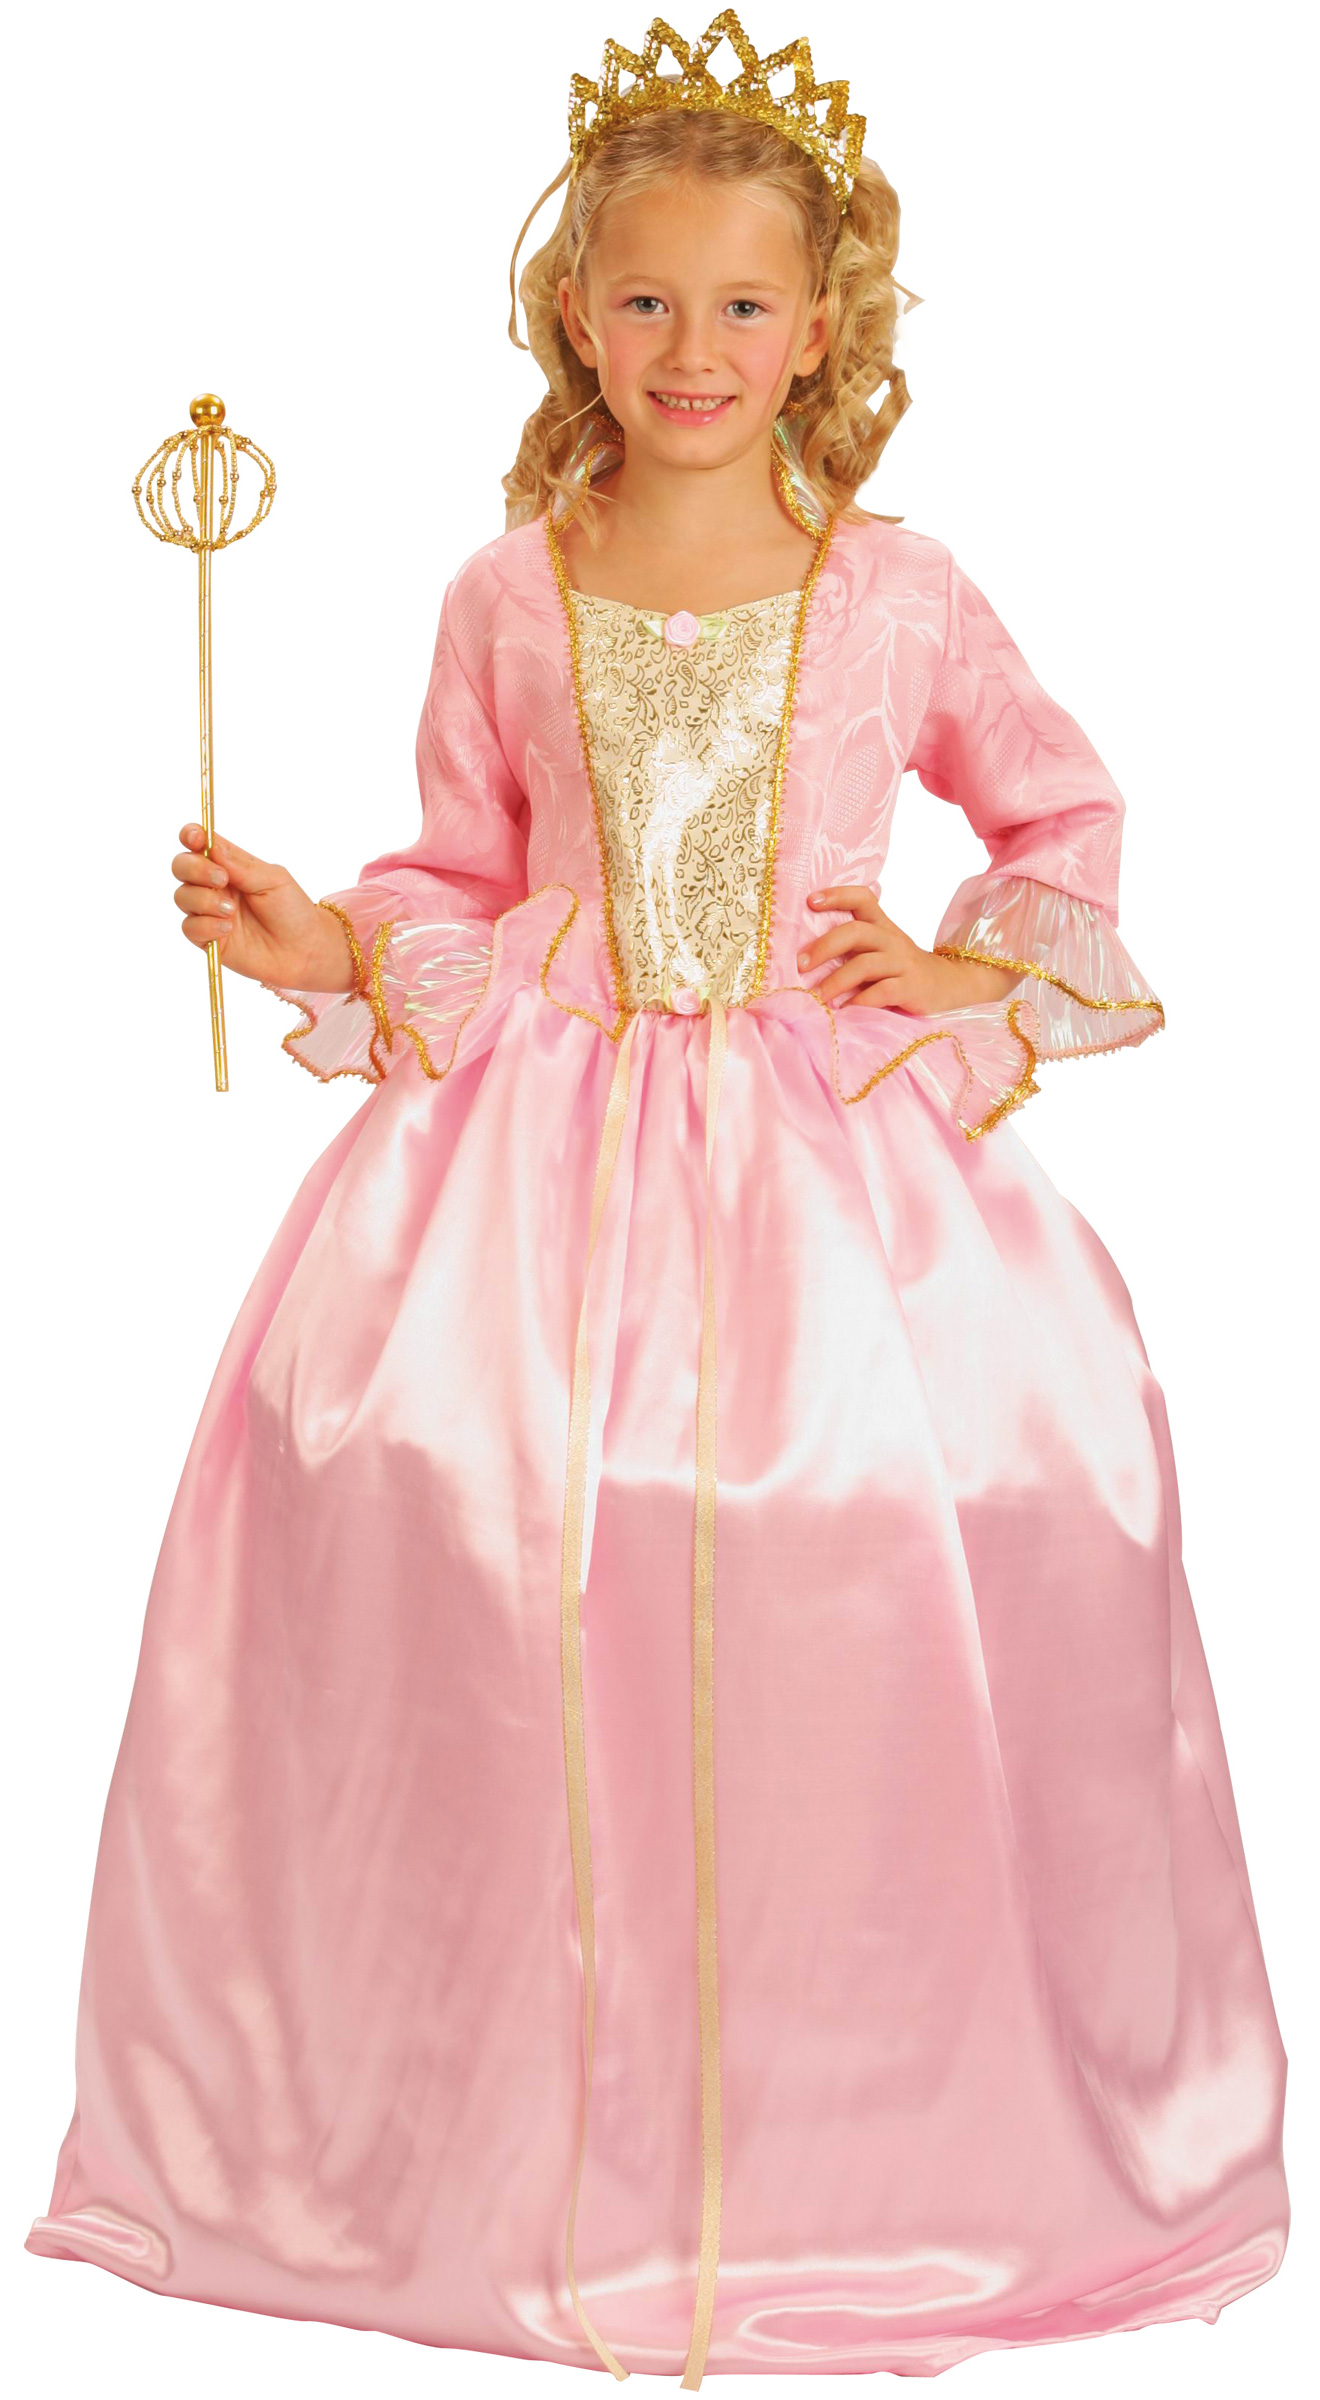 Anmutige Prinzessin Kinderkostüm Fee rosa Cod.172227